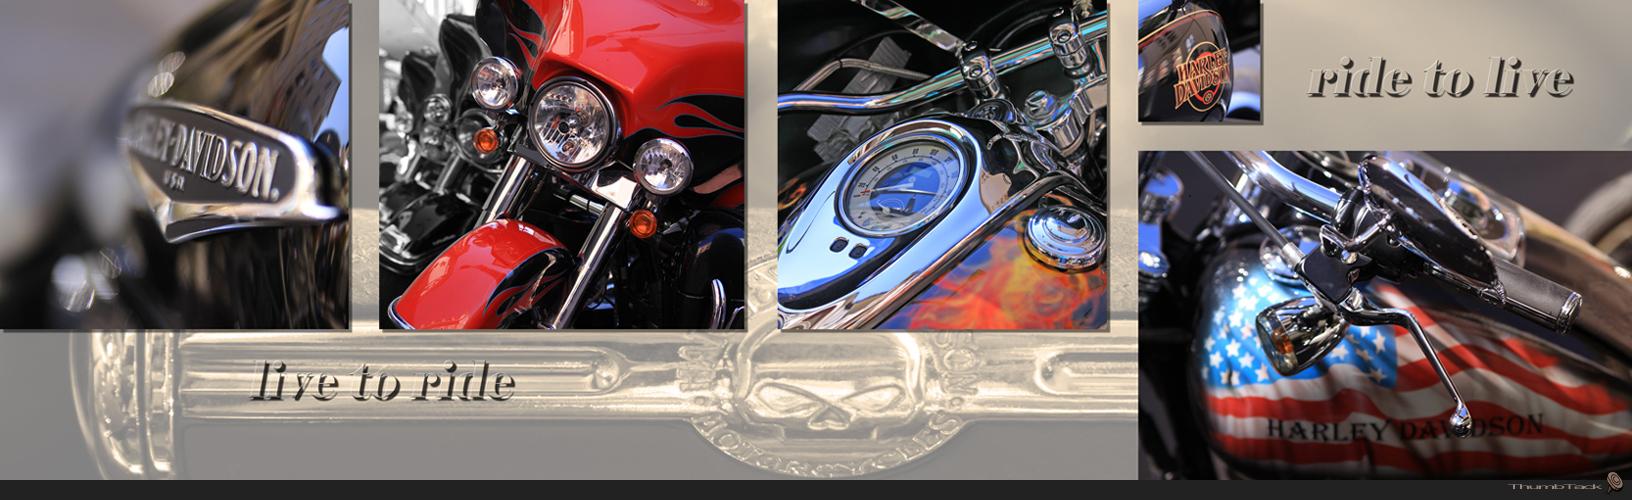 * Harley Davidson 2 *